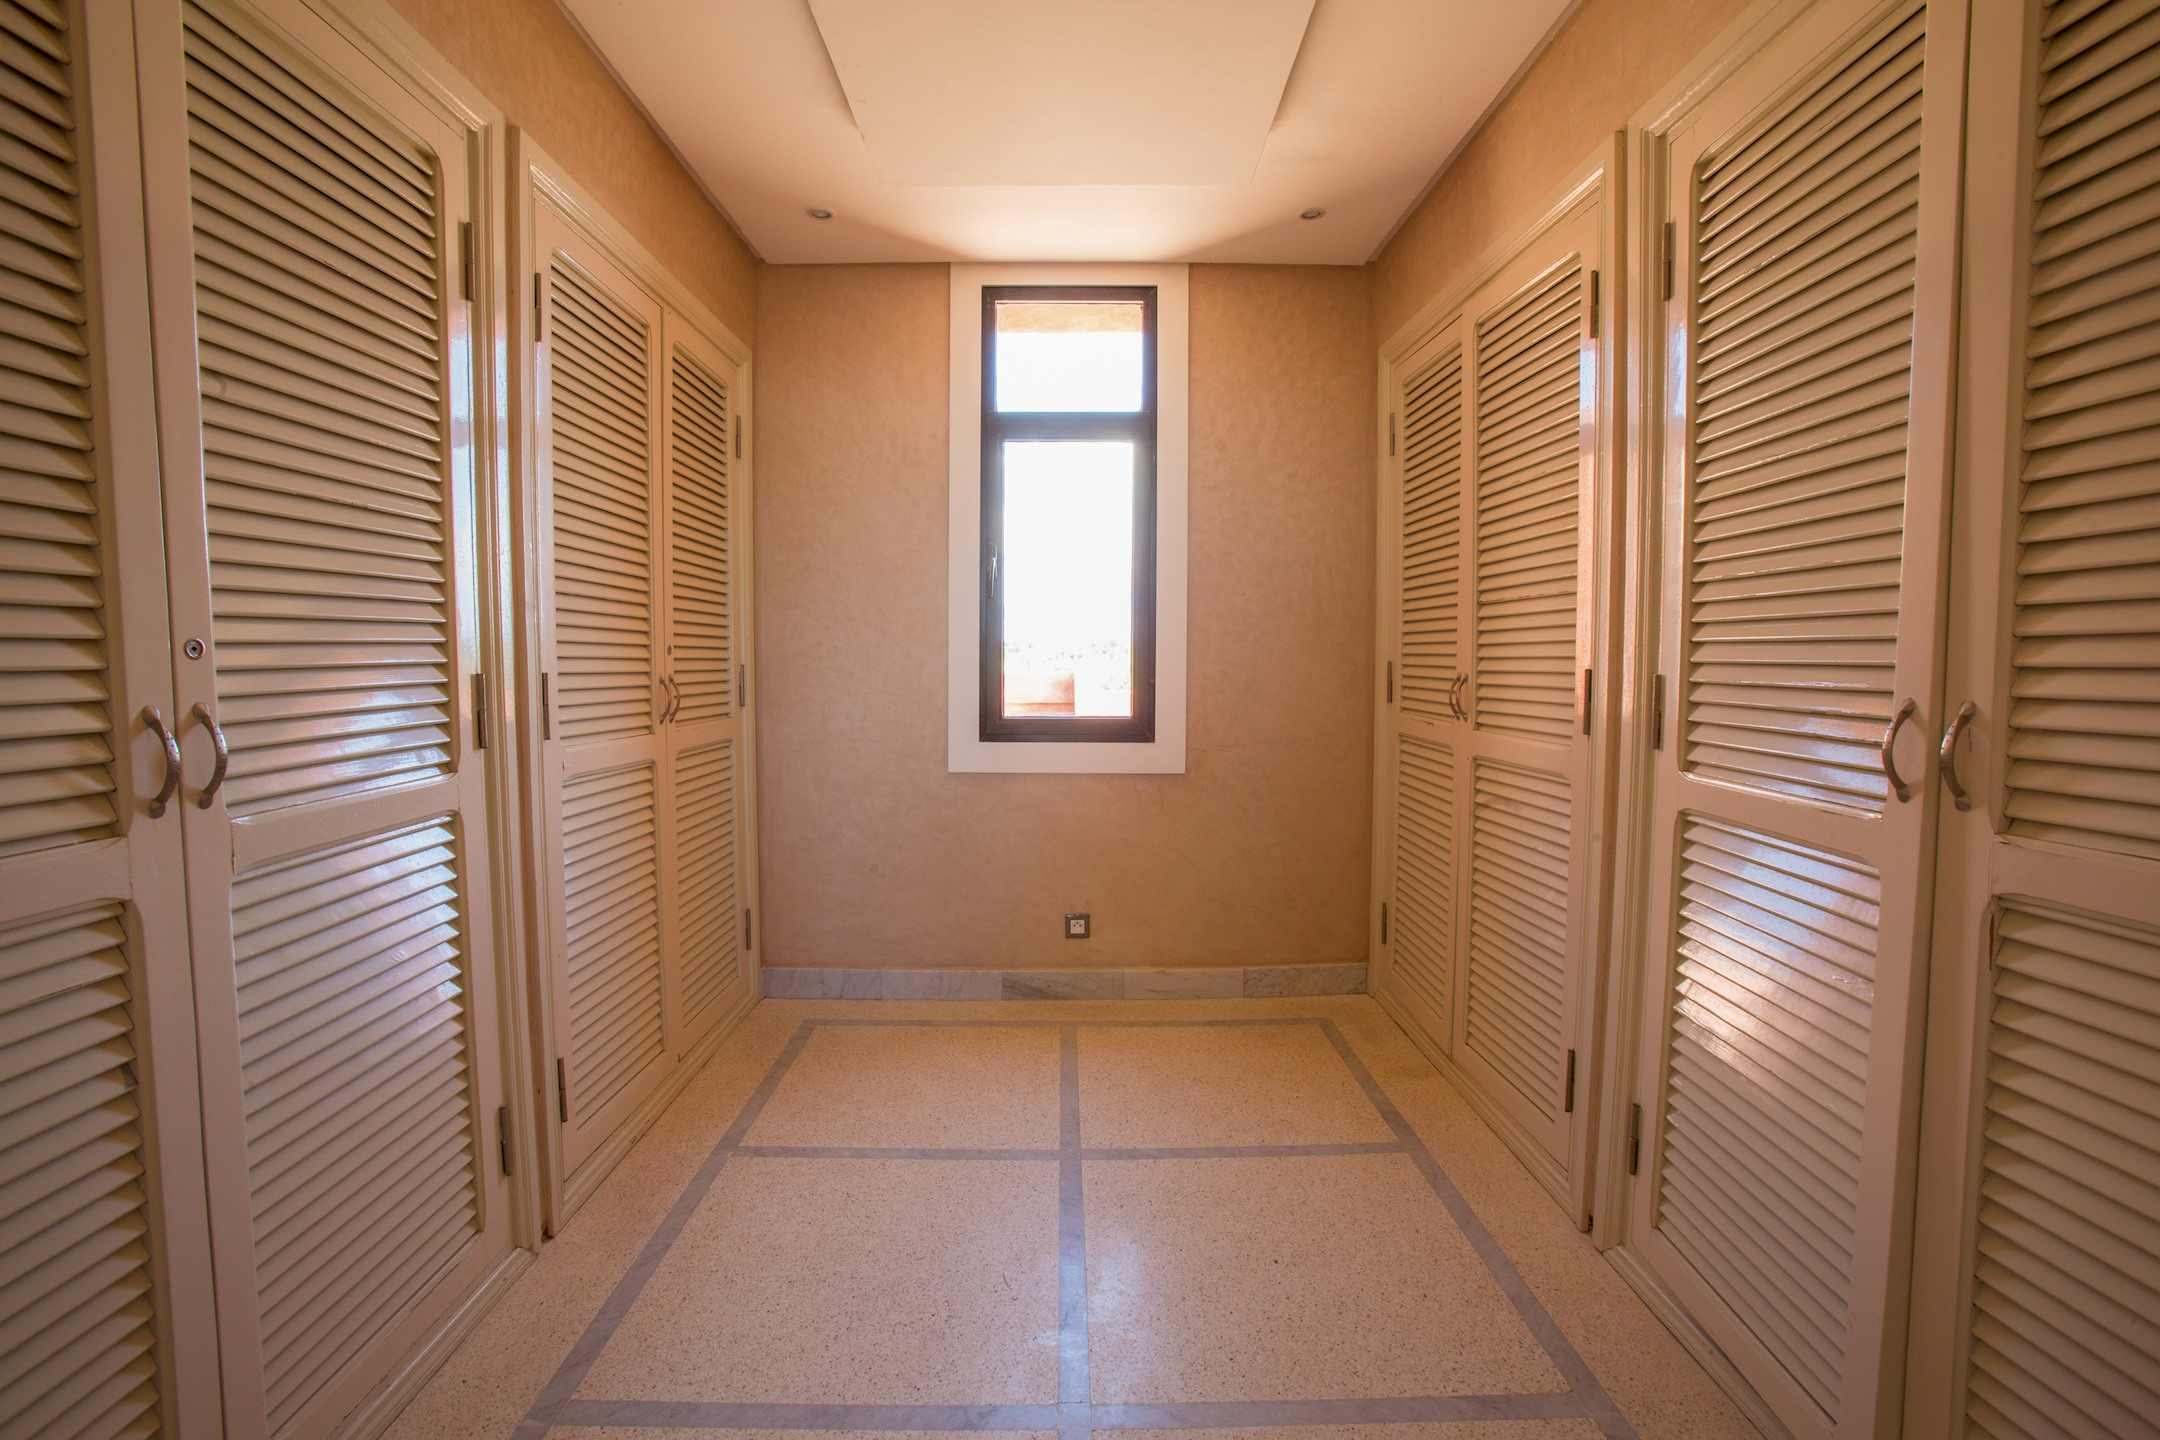 Apartment VILLA KOUTOUBIA - PISCINE CHAUFFEE  HAMMAM  JACUZZI  PETIT-DEJEUNER A MARRAKECH photo 20444588